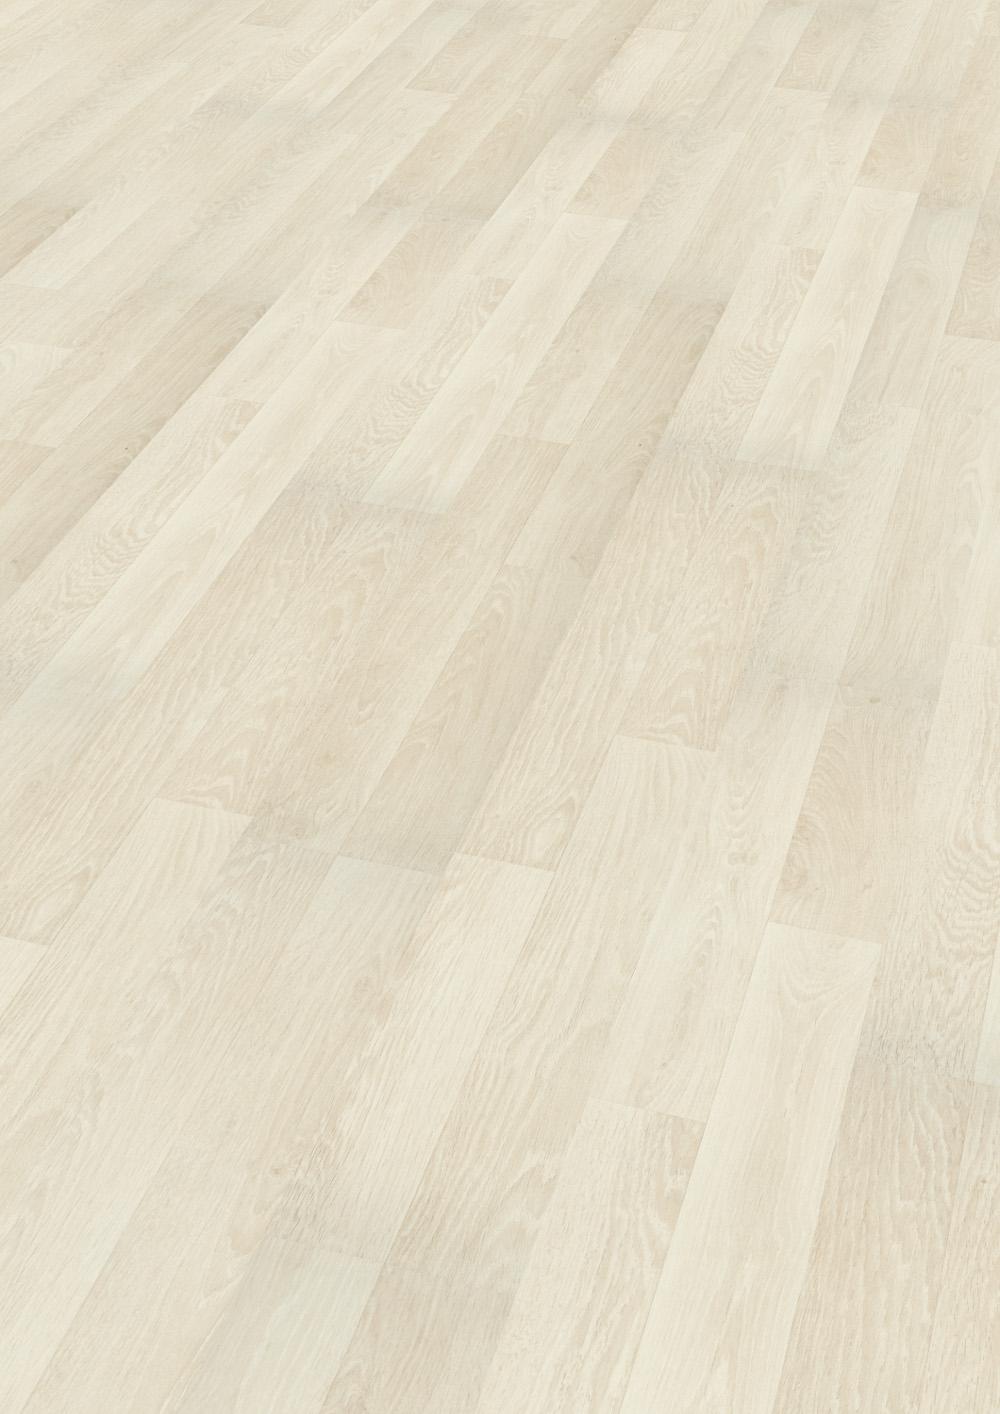 wineo laminat white oak 2 stab wineo 300. Black Bedroom Furniture Sets. Home Design Ideas